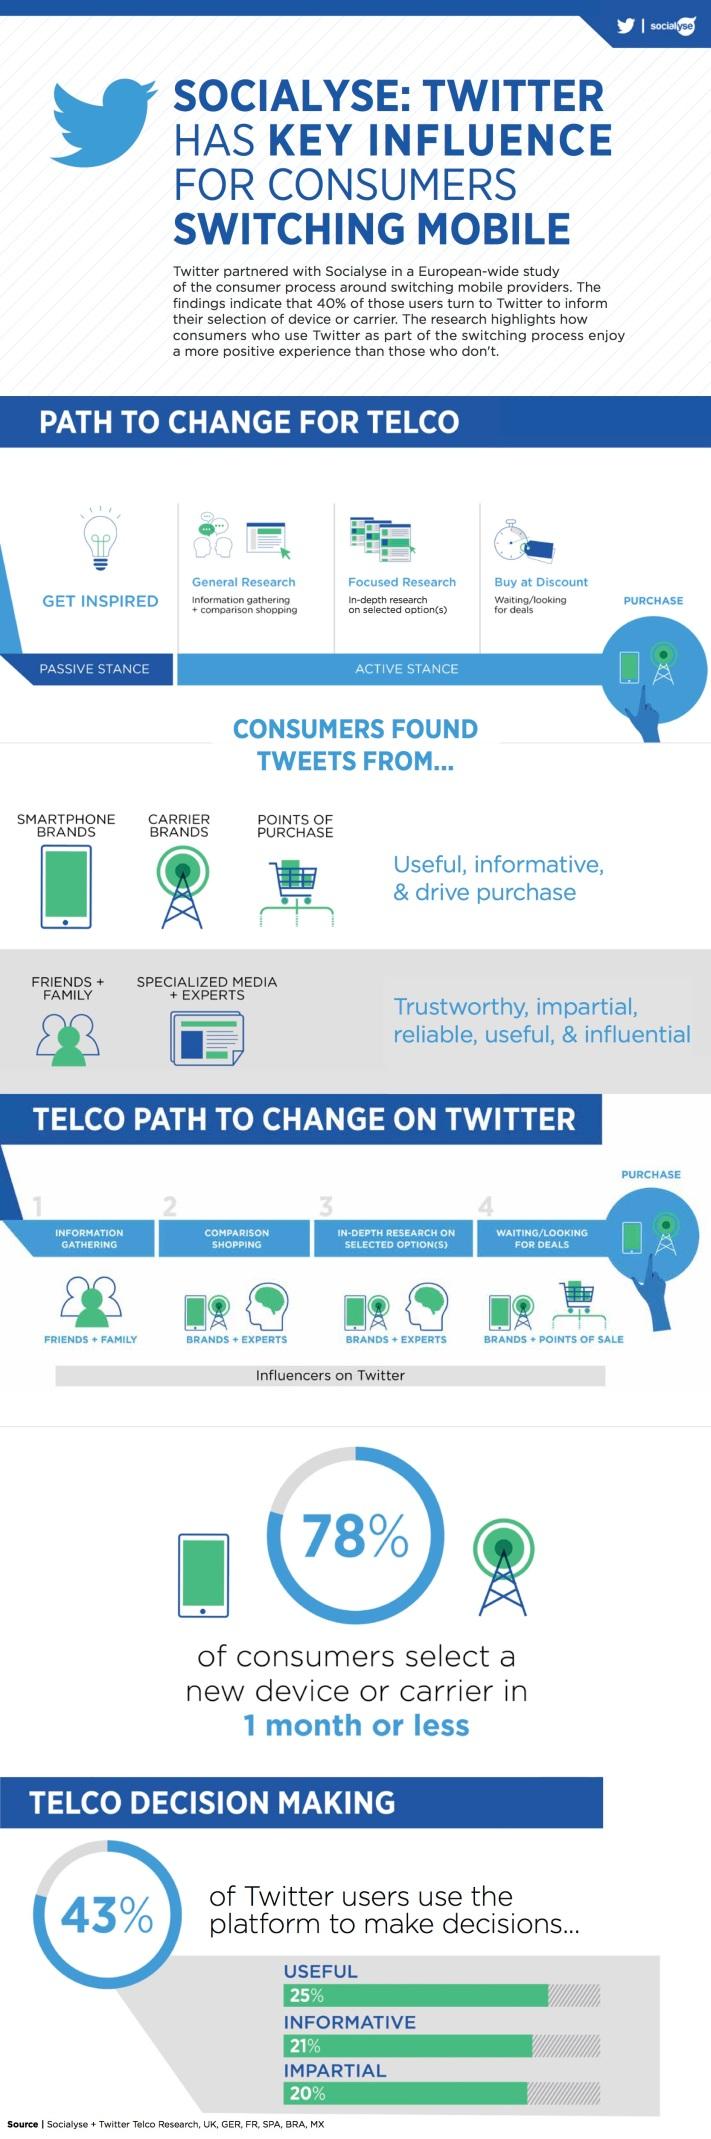 Telco Infographic_07112016